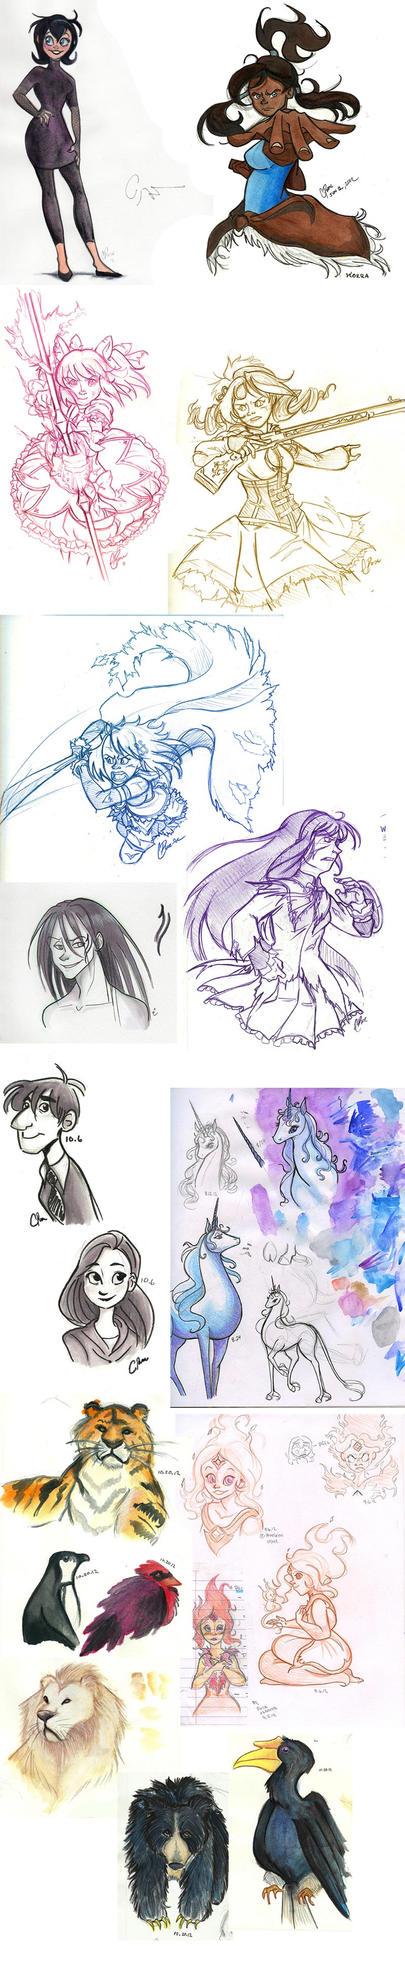 Sketch Dump 1 by neofeliss